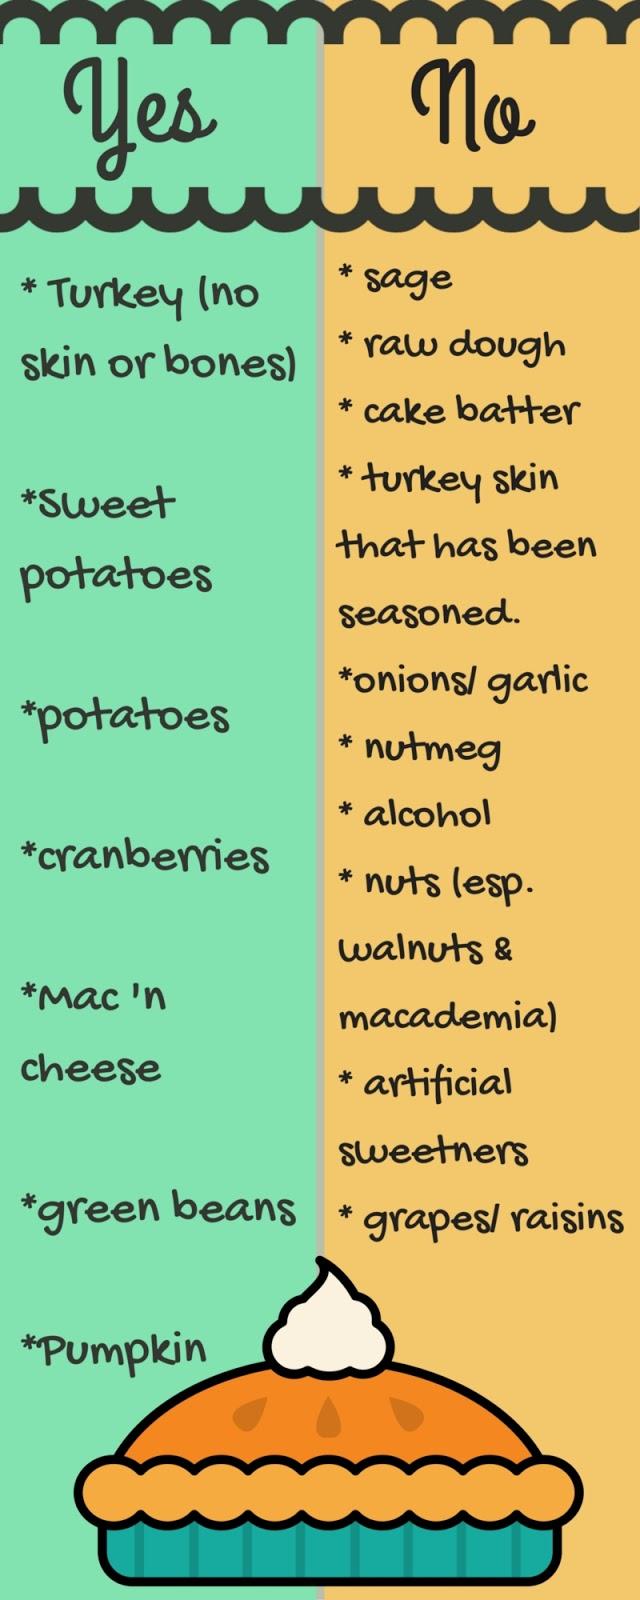 Your 1,500-Calorie, Post-Thanksgiving Detox Plan